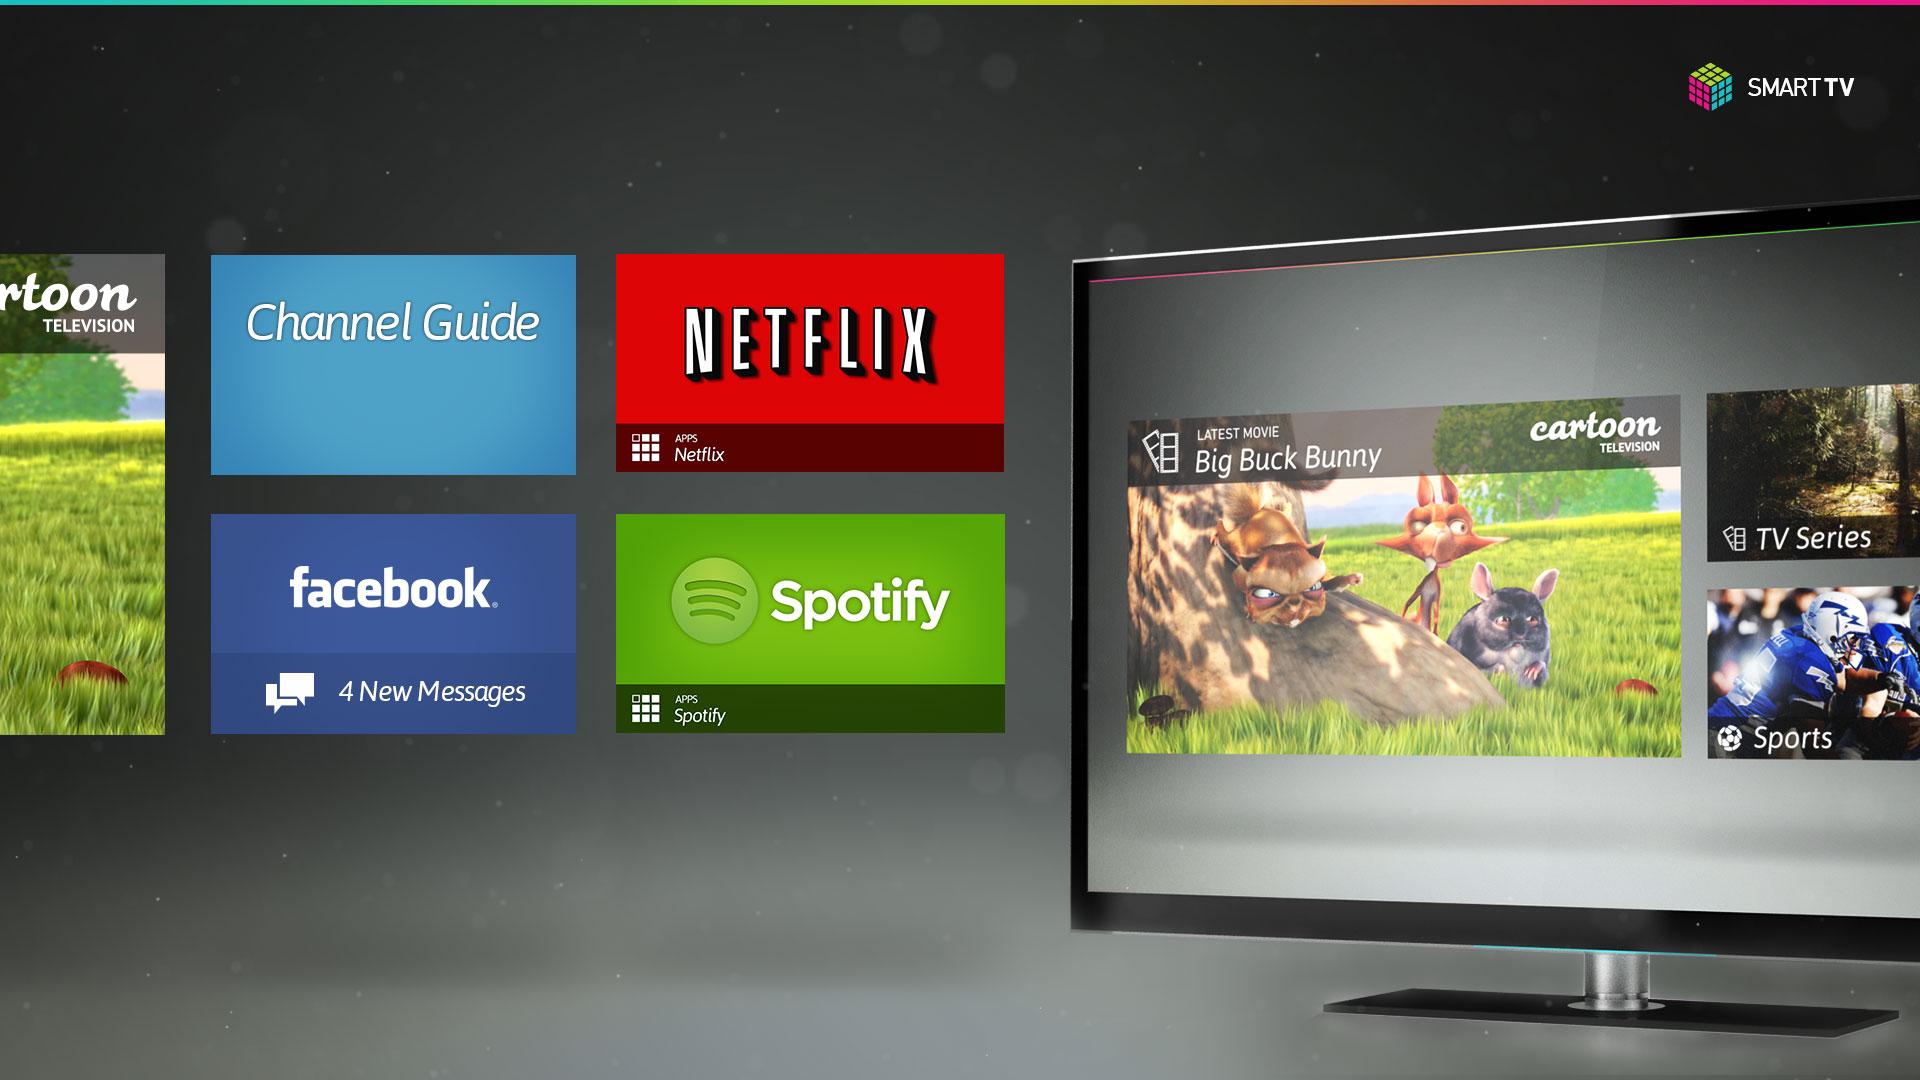 Smart TV Demo